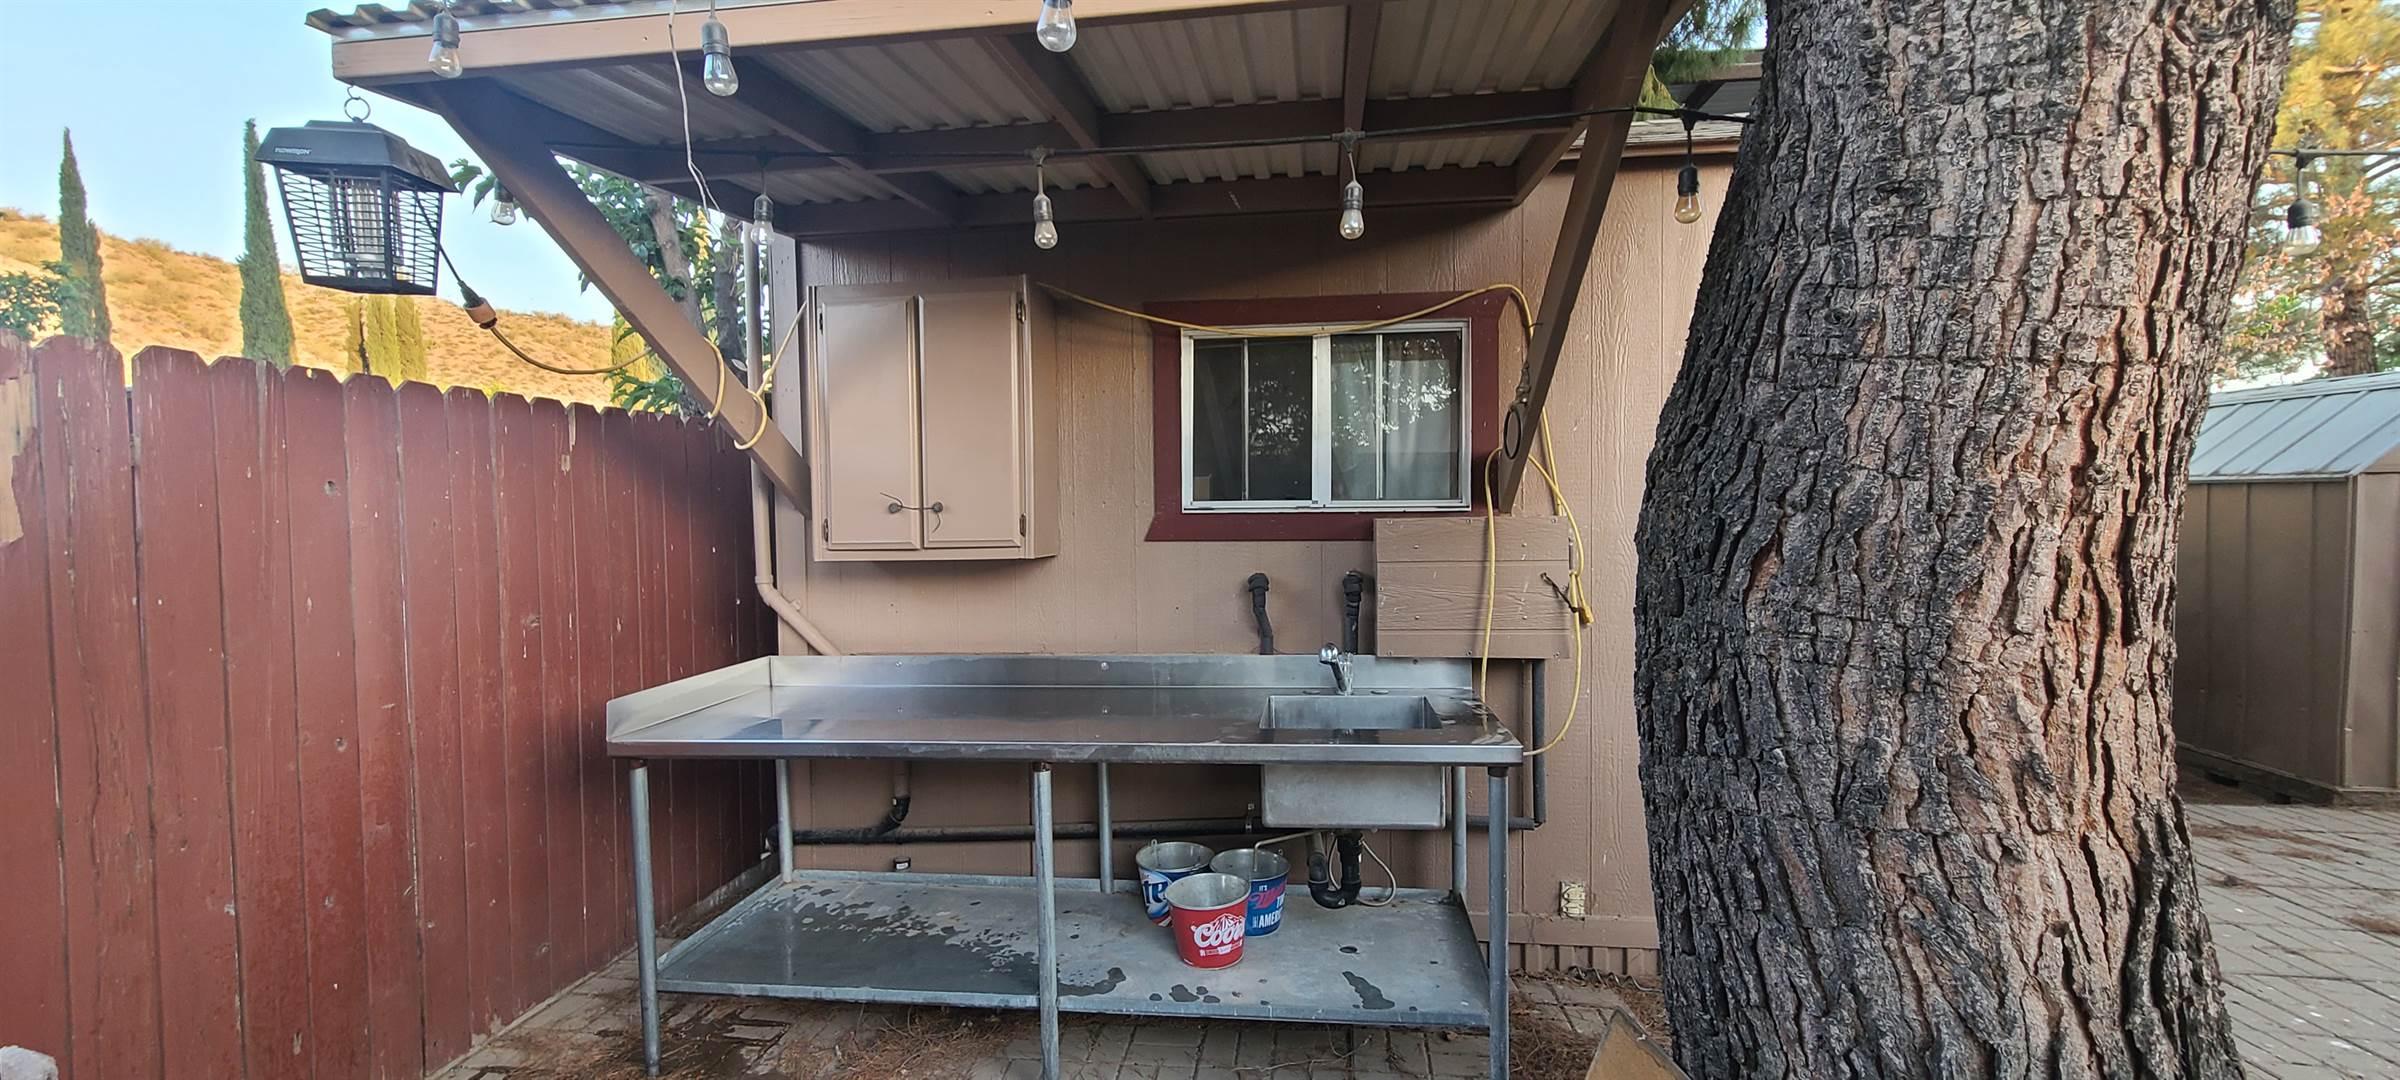 731 N Stagecoach Trl, Roosevelt, AZ 85545